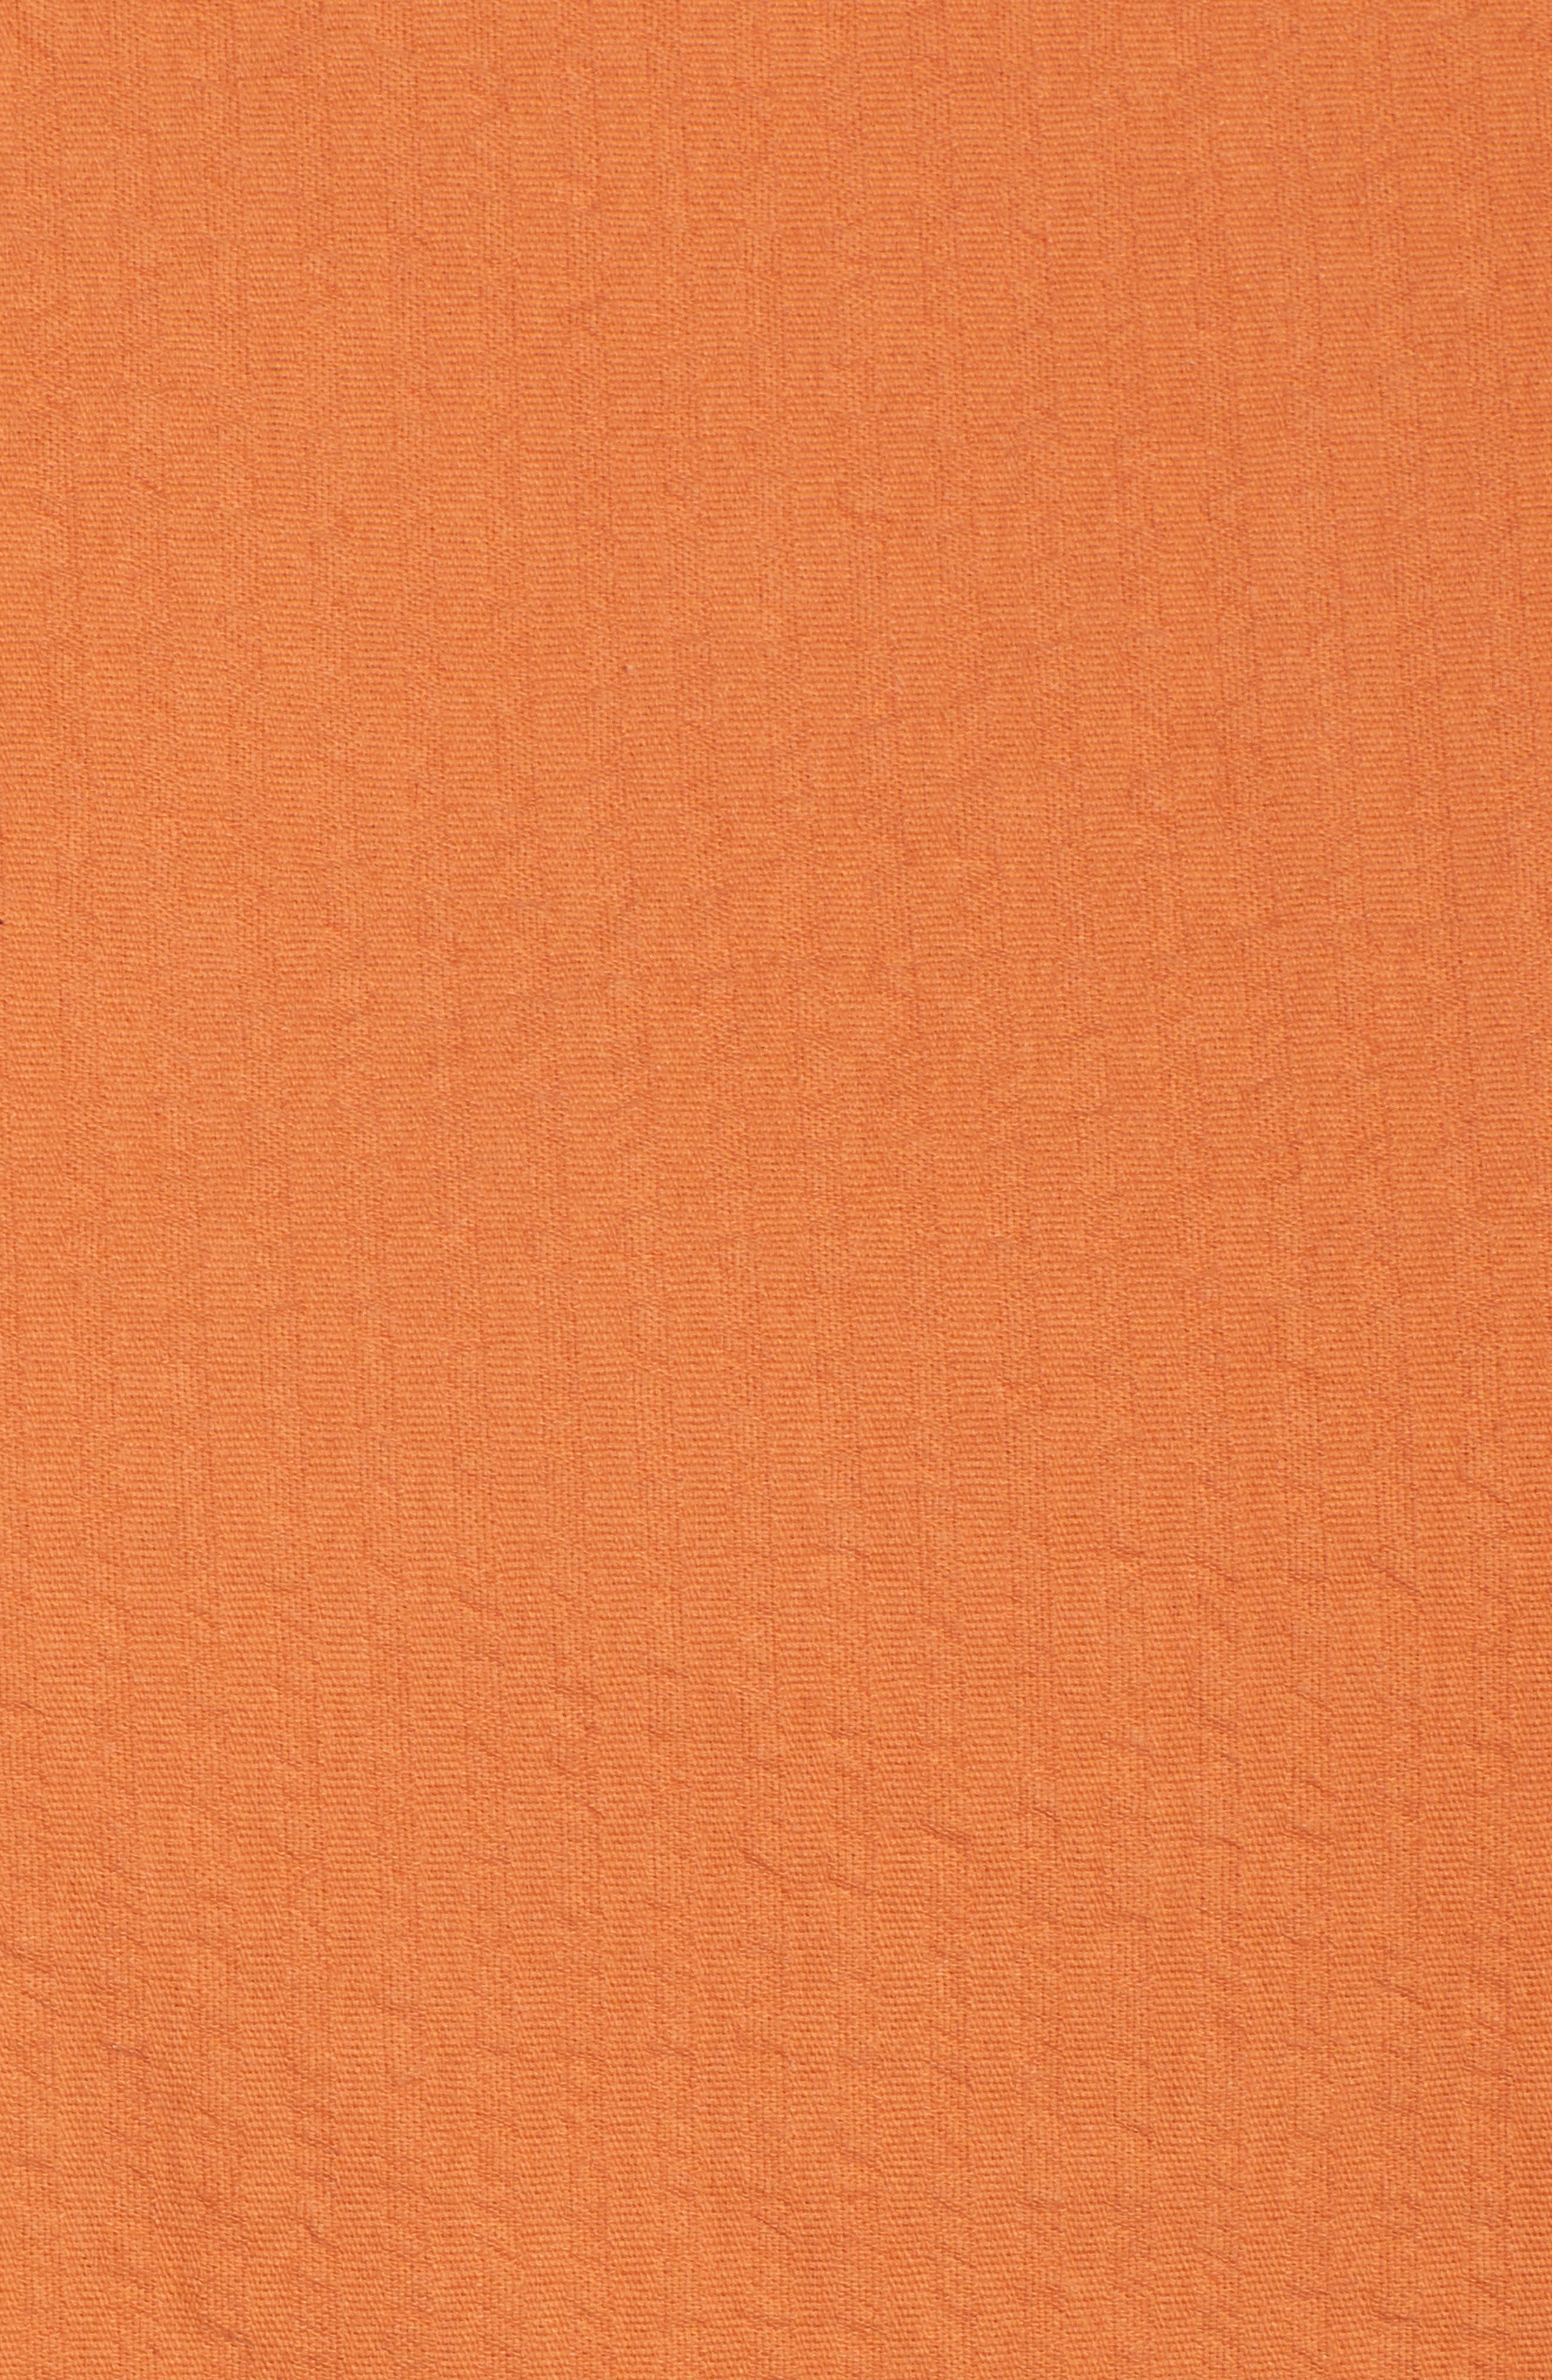 Seersucker Ruffle Top,                             Alternate thumbnail 6, color,                             TAN ADOBE